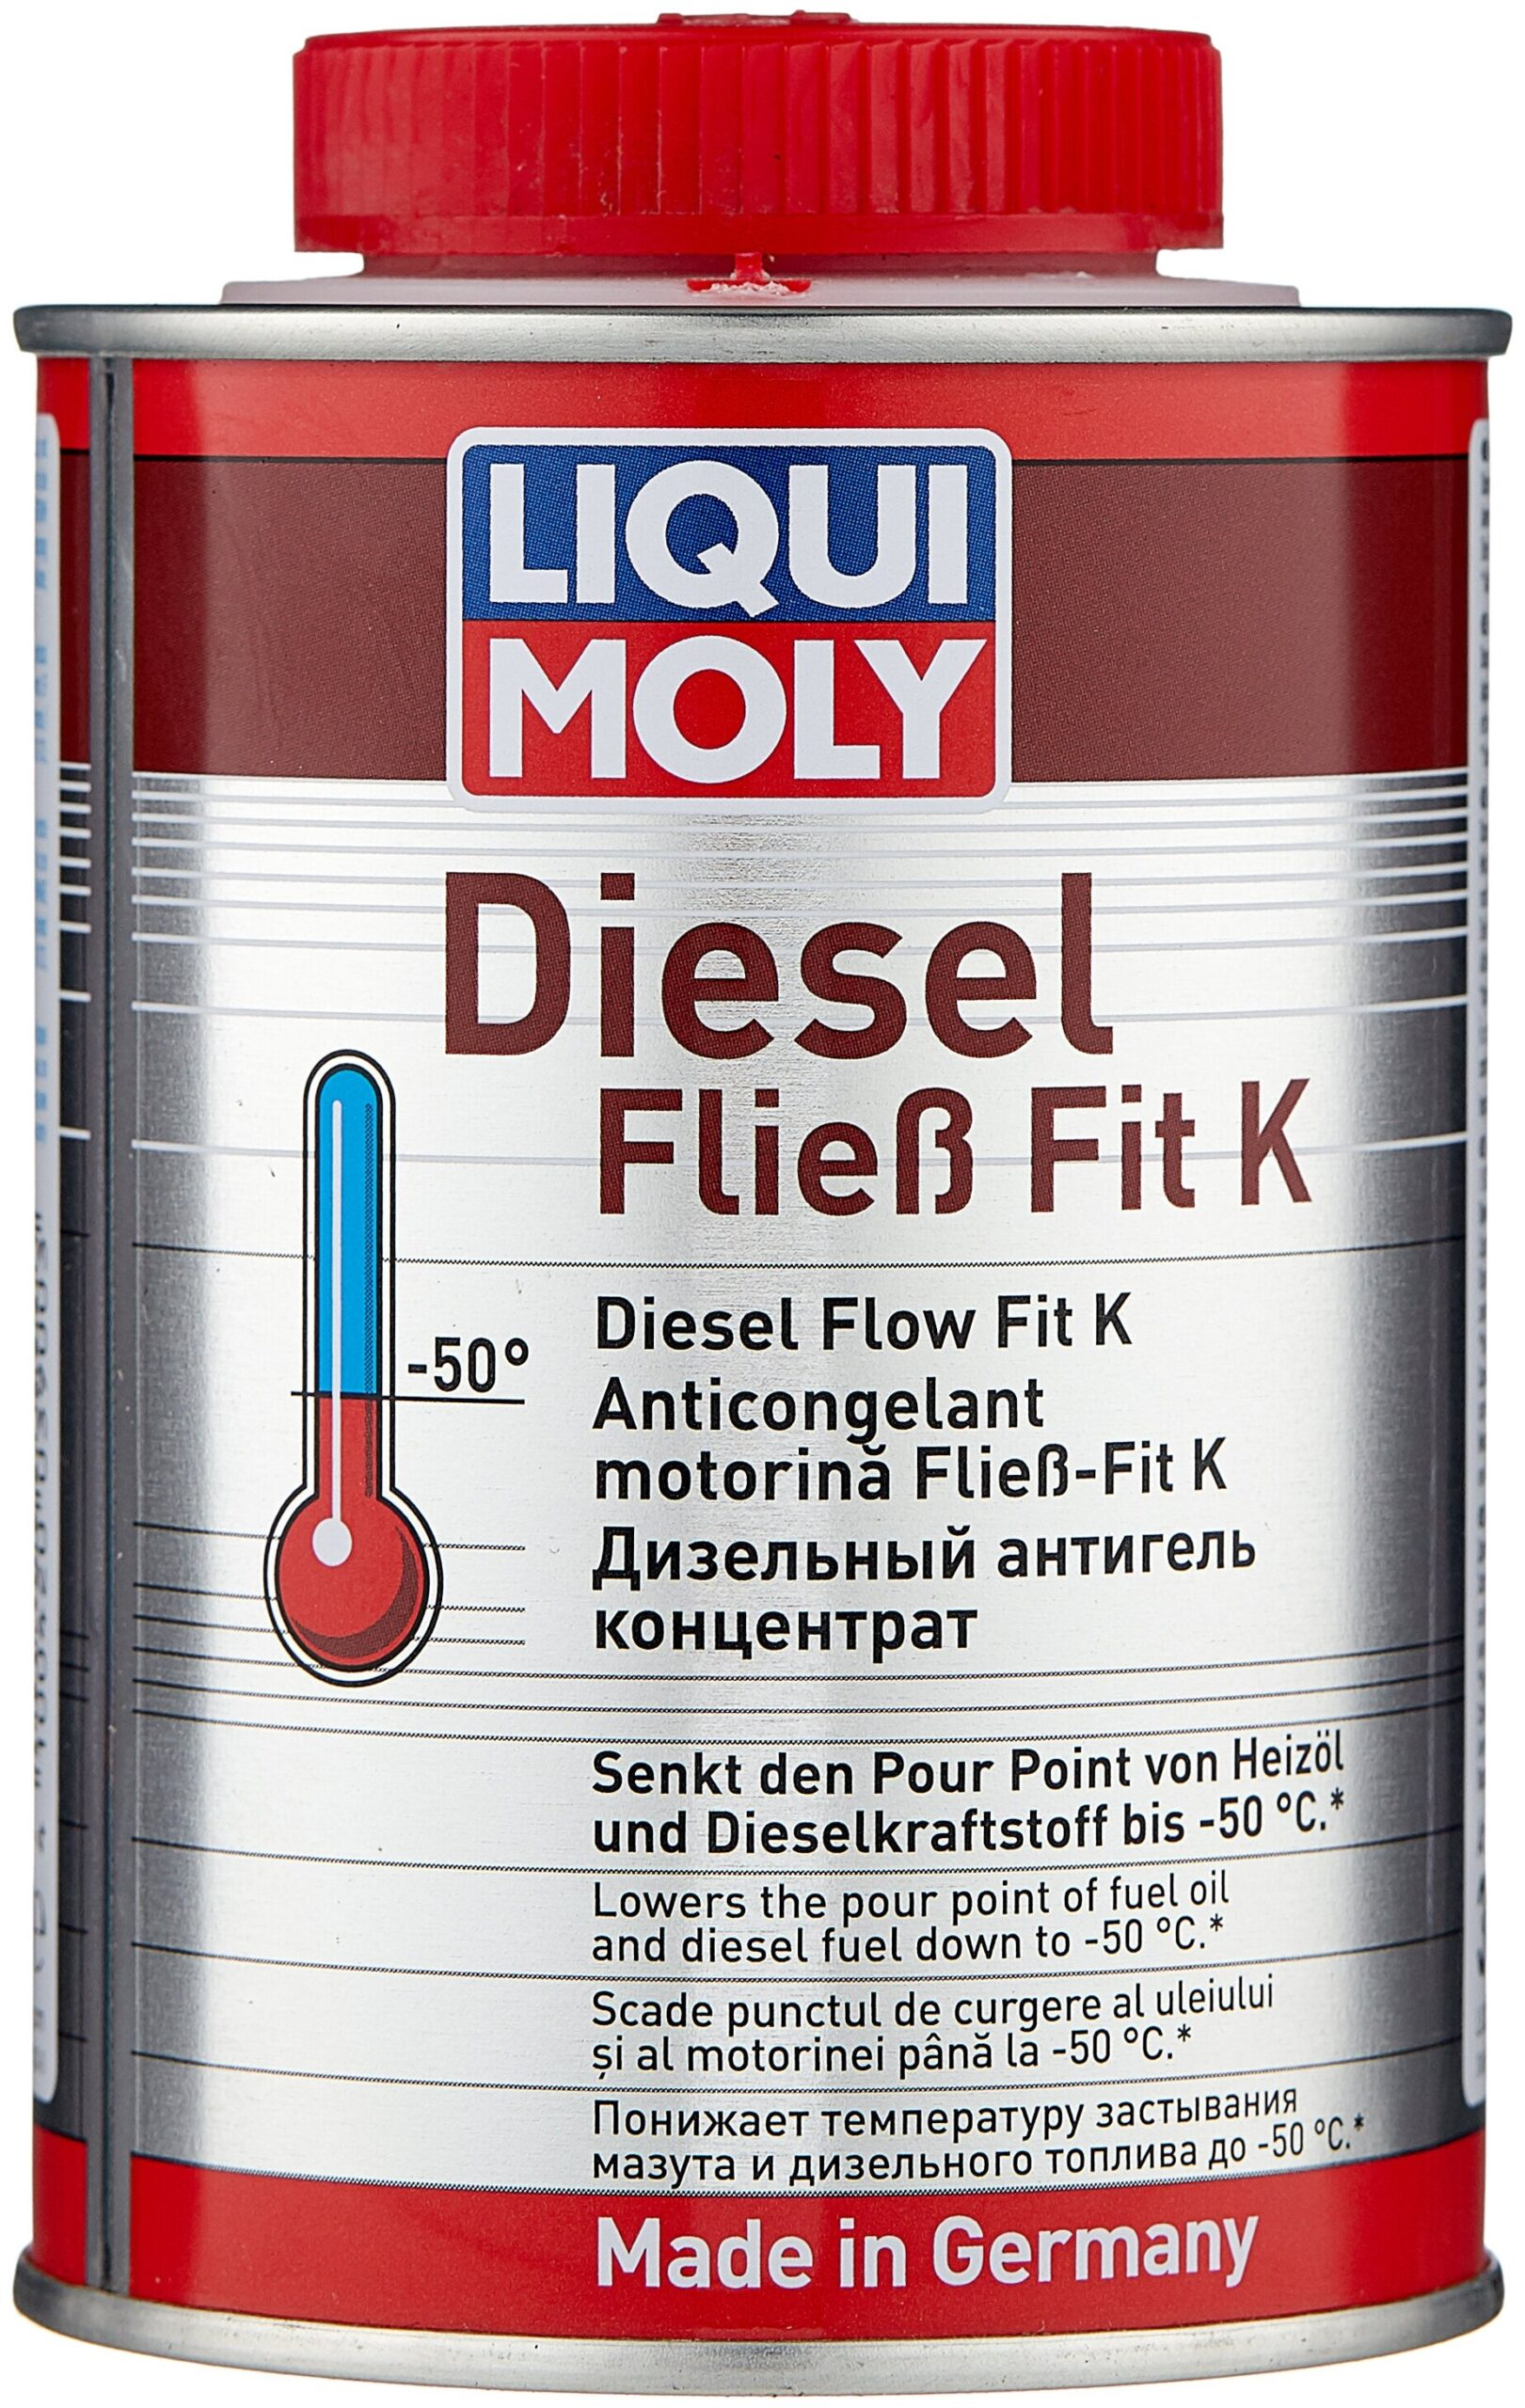 Liqui Moly Diesel Fliess Fit K 0.25 L Scaled